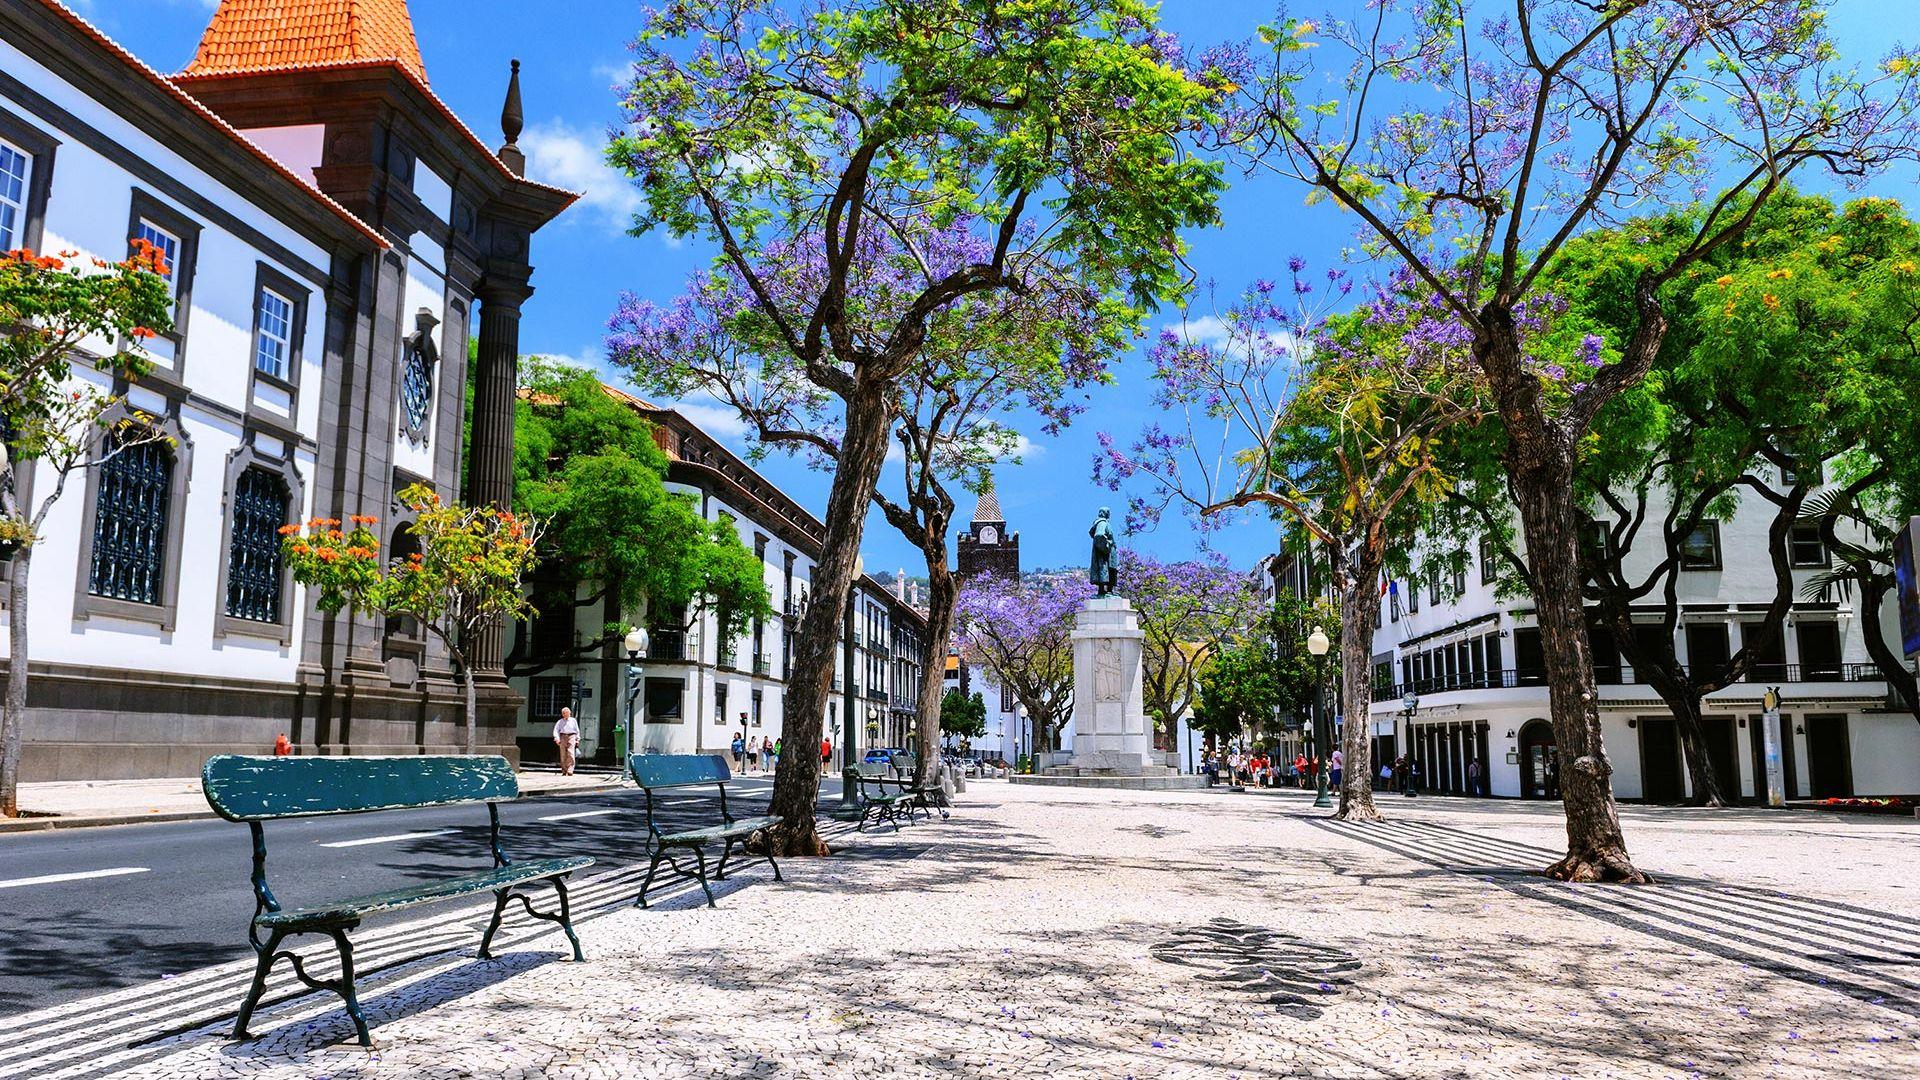 Sejur Charter Madeira, 8 zile - aprilie 2022